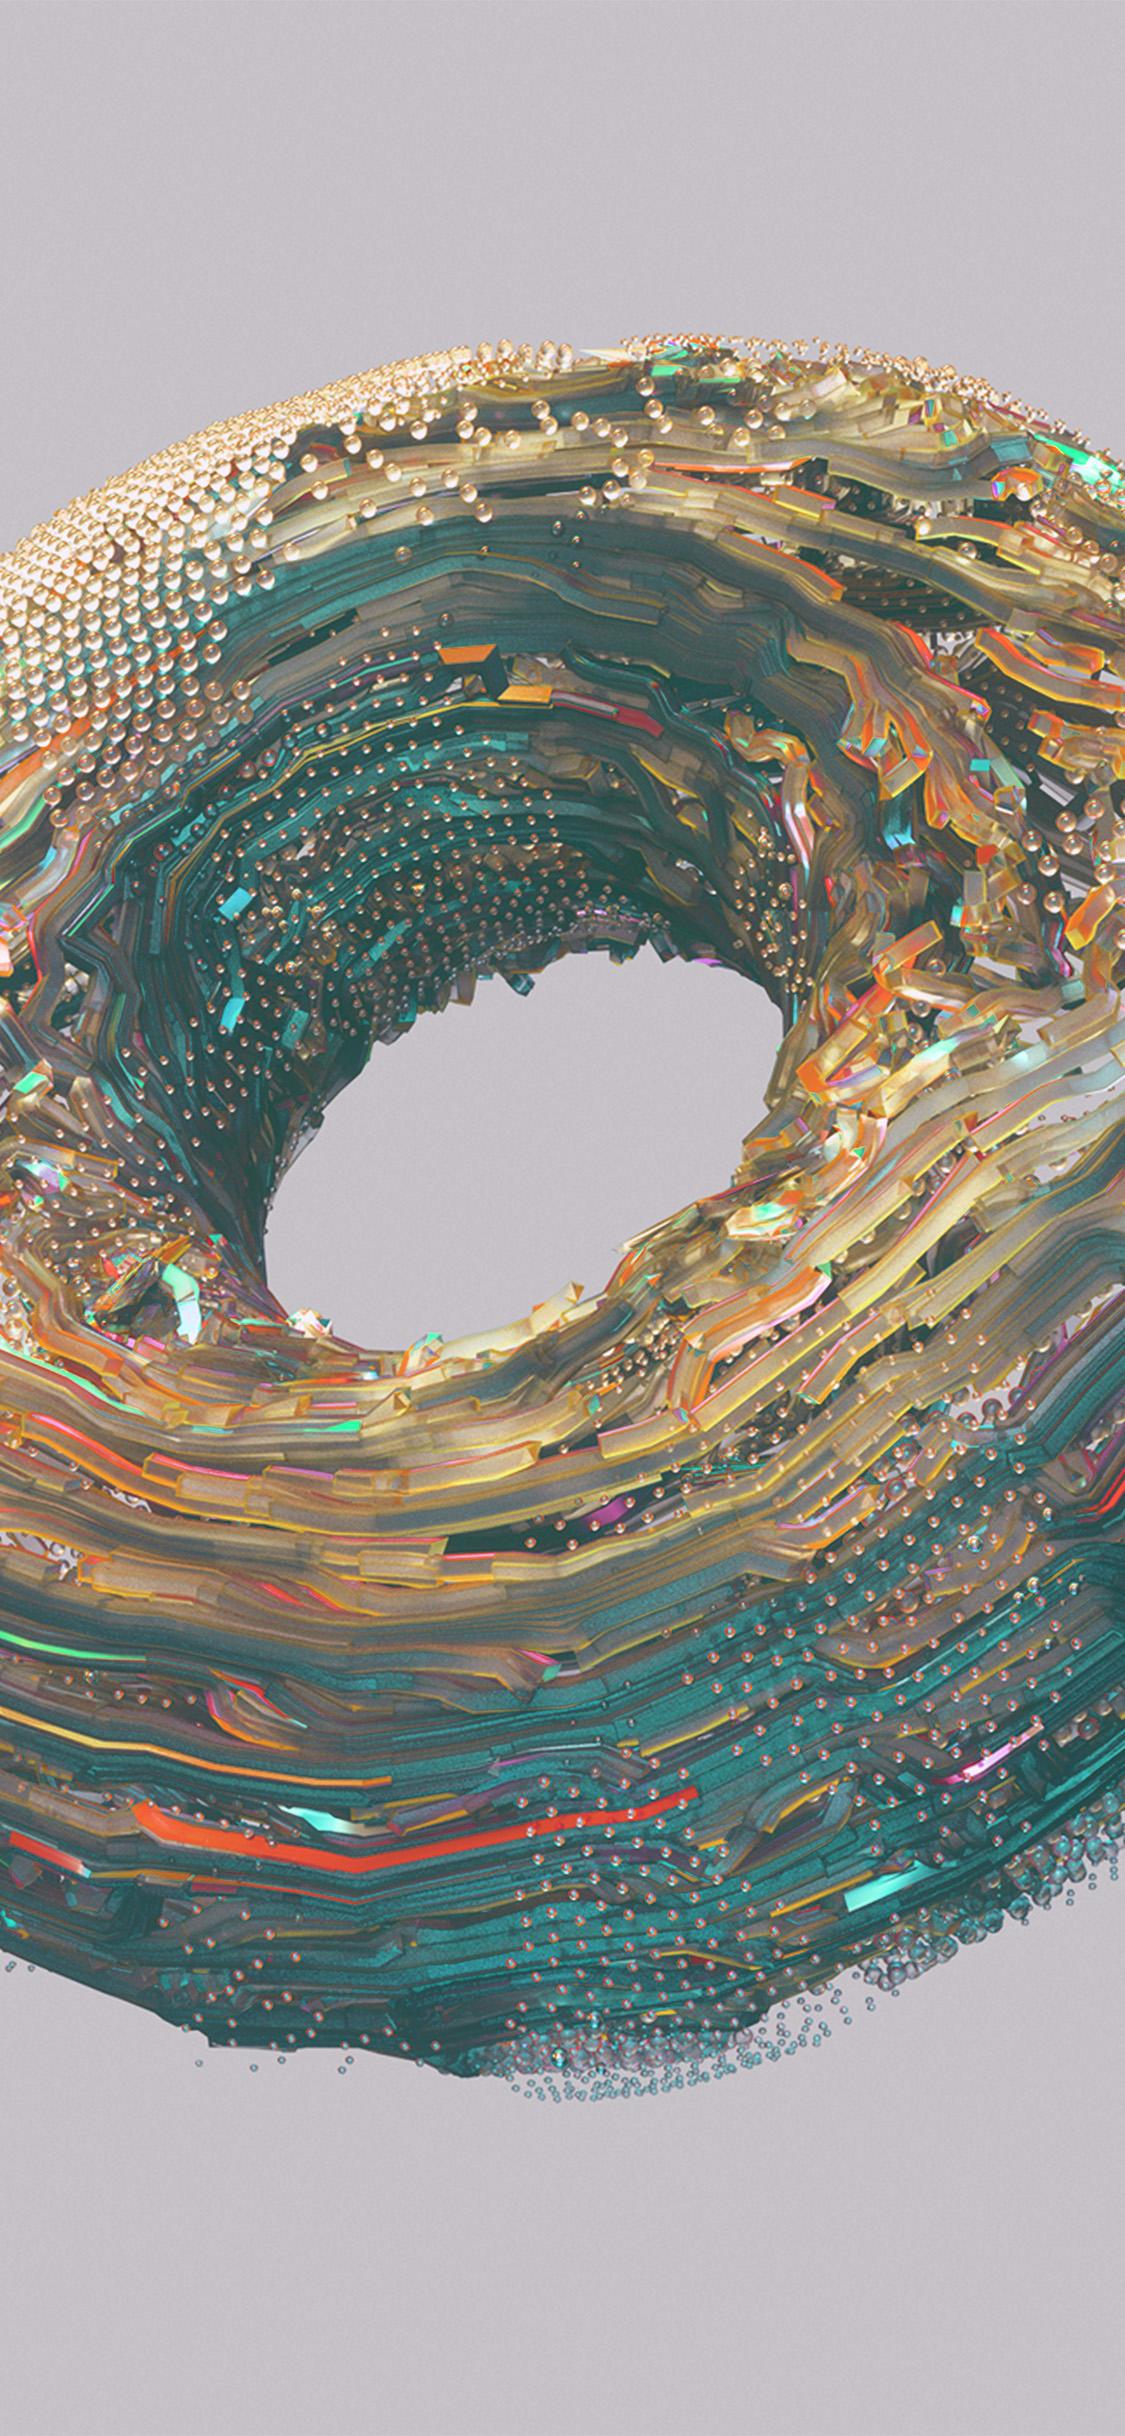 iPhonexpapers.com-Apple-iPhone-wallpaper-bc20-digital-circle-color-art-illustration